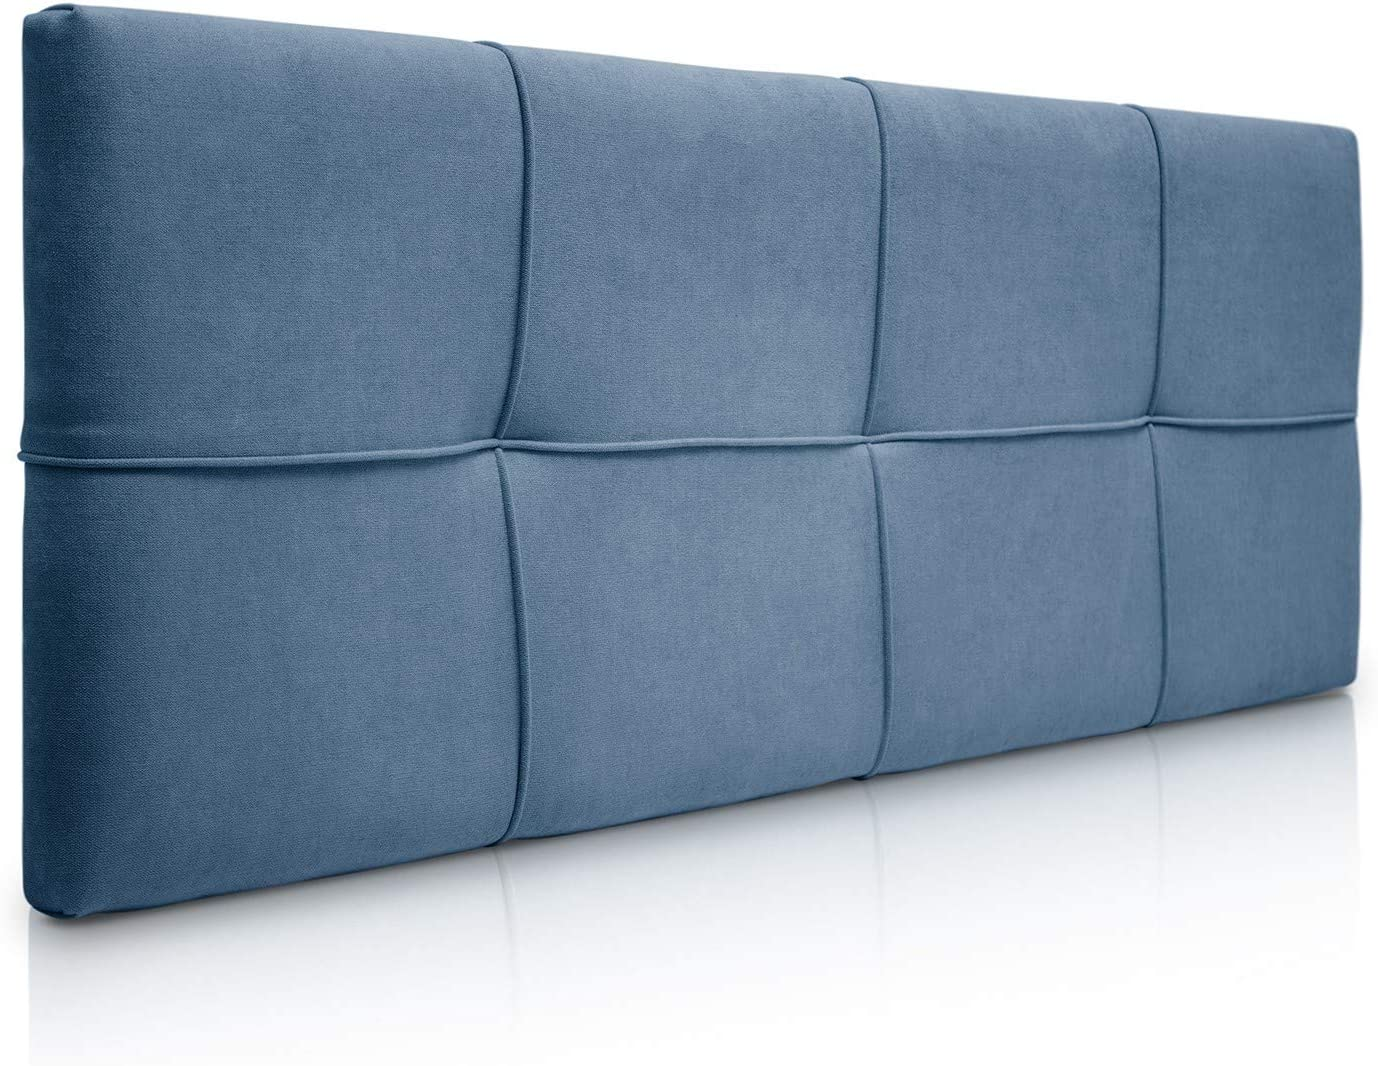 Modelo Square para Camas de 90 100 x 57 cm SUENOSZZZ-ESPECIALISTAS DEL DESCANSO Cabecero de Cama tapizado Tela Azul